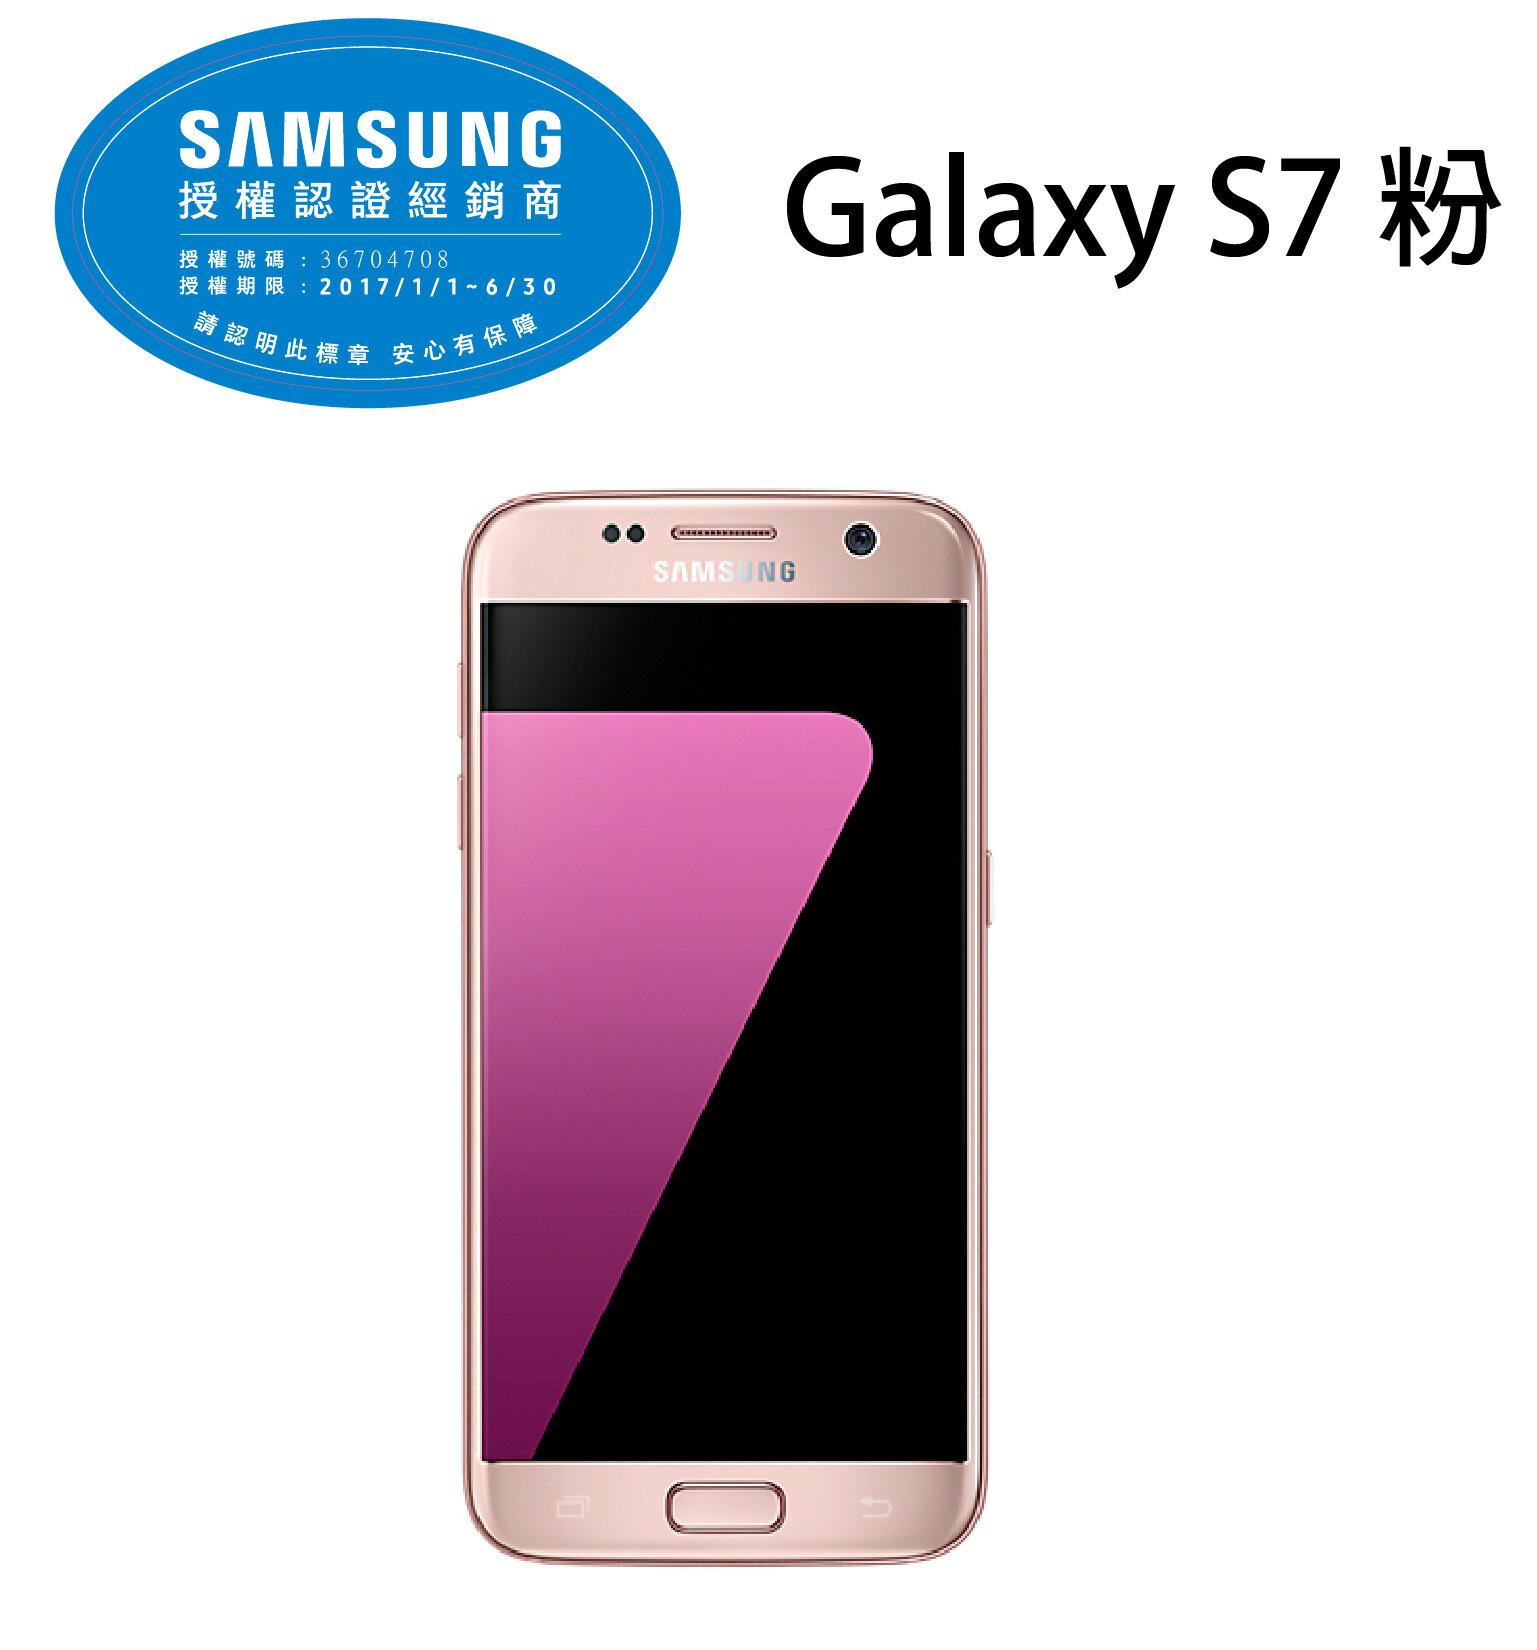 Samsung Galaxy S7 (G930) 32GB-粉色《贈原廠閃電快充行動電源+卡娜赫拉保溫杯+OTG-32G隨身碟》